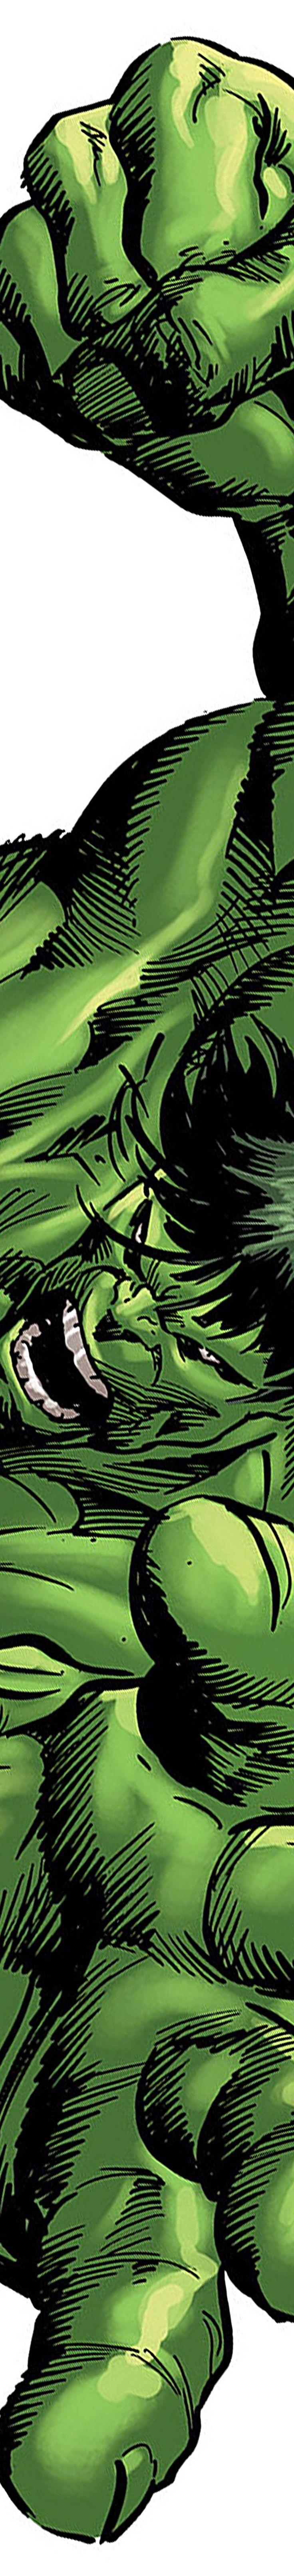 41 best images about Hulk on Pinterest | Keep calm, Potato heads ...